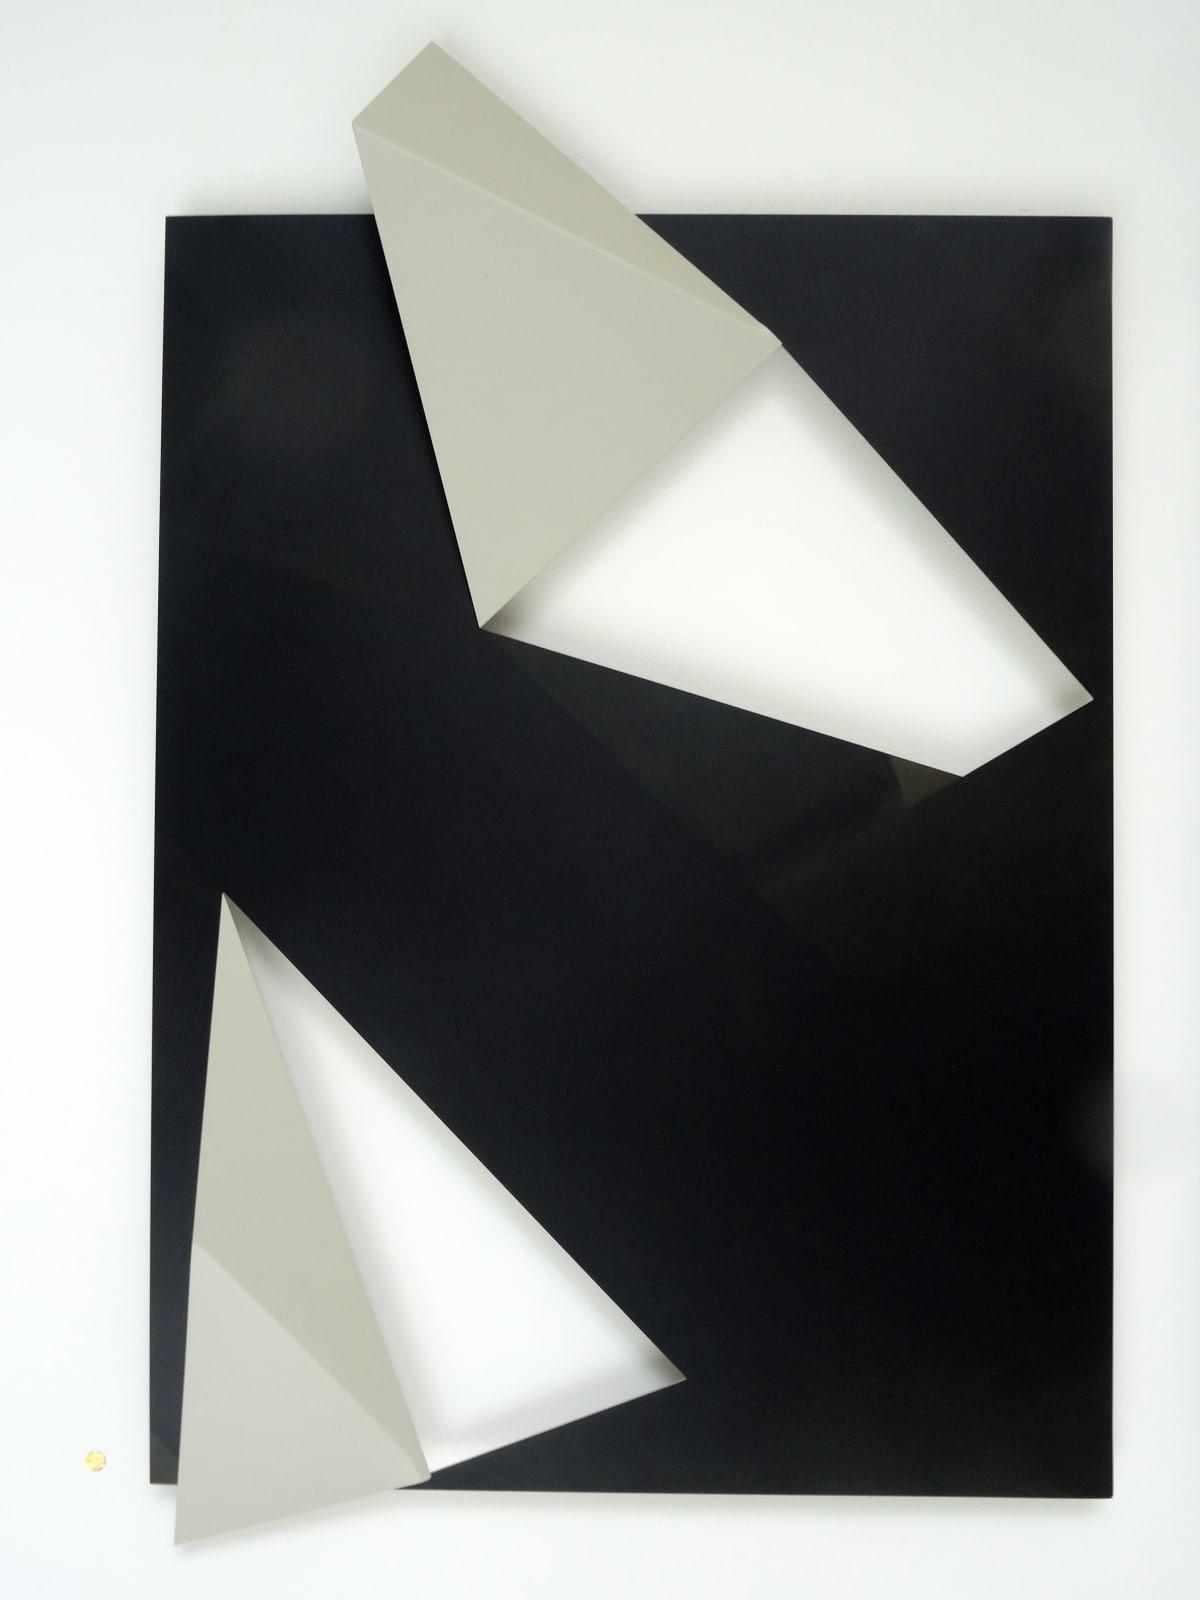 Urban Tectonic No.4, 2018 Cut and Folded Printed Aluminium Plate 42 1/10 × 28 7/10 in 107 × 73 cm